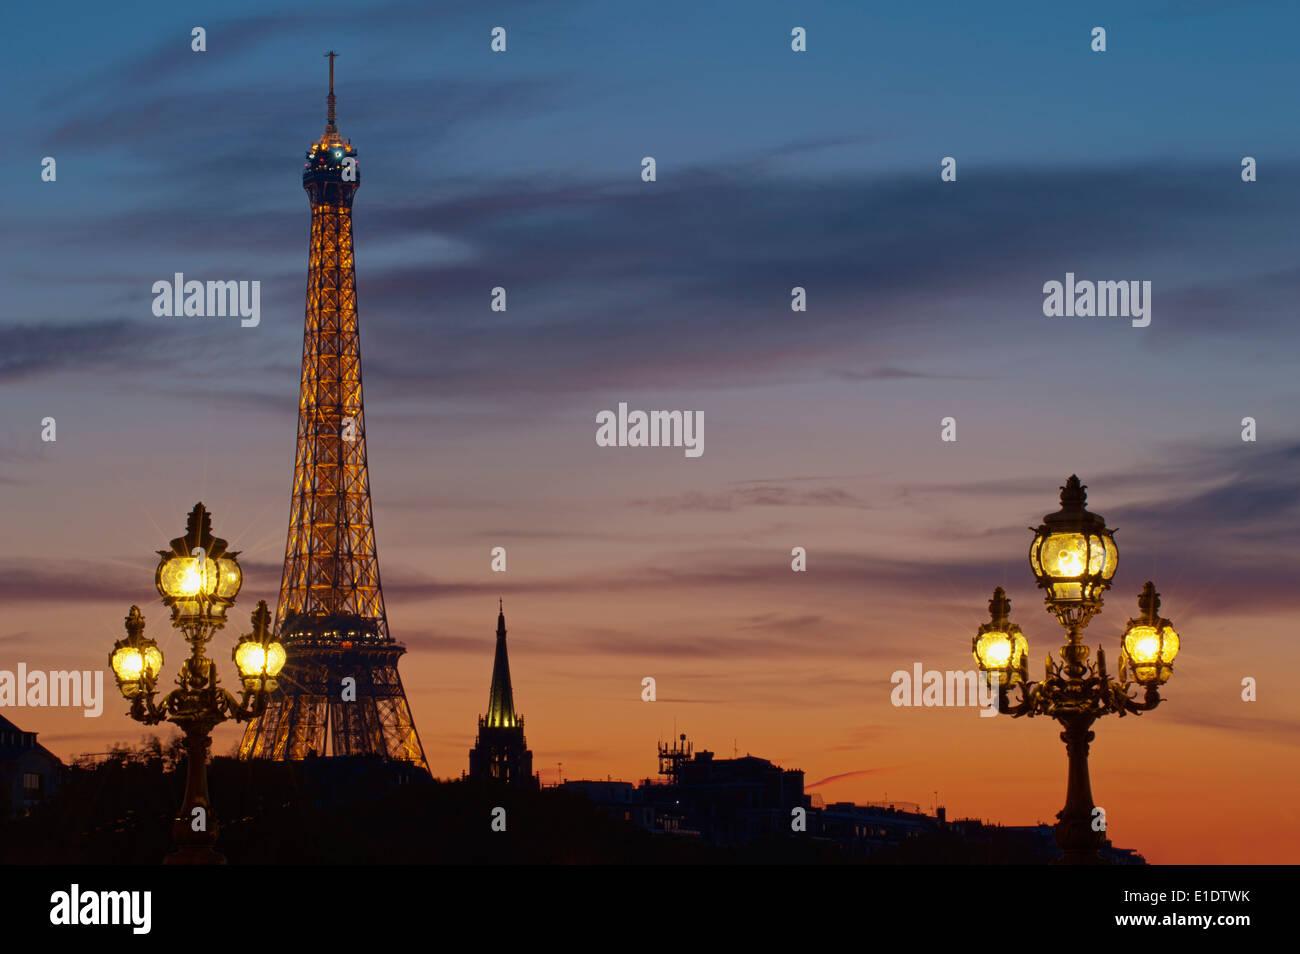 France, Paris, Eiffel Tower at night - Stock Image